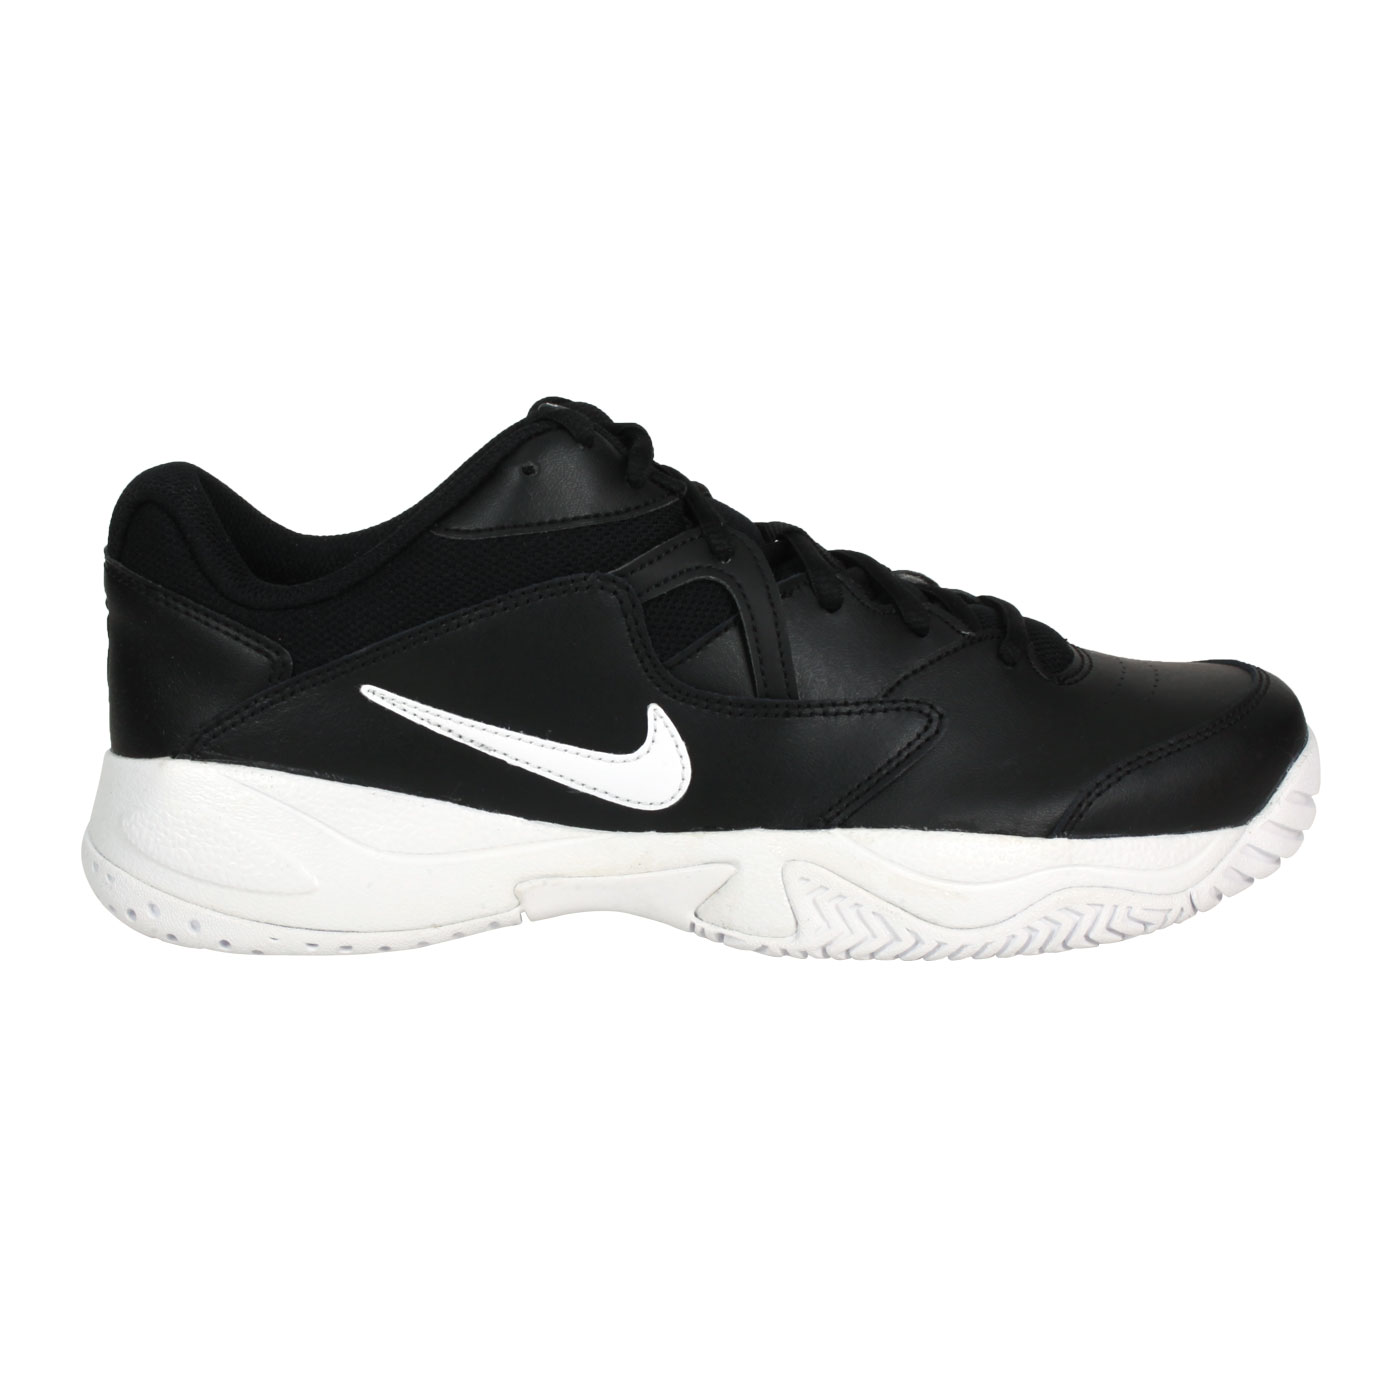 NIKE 男款網球鞋  @COURT LITE 2@AR8836005 - 黑白